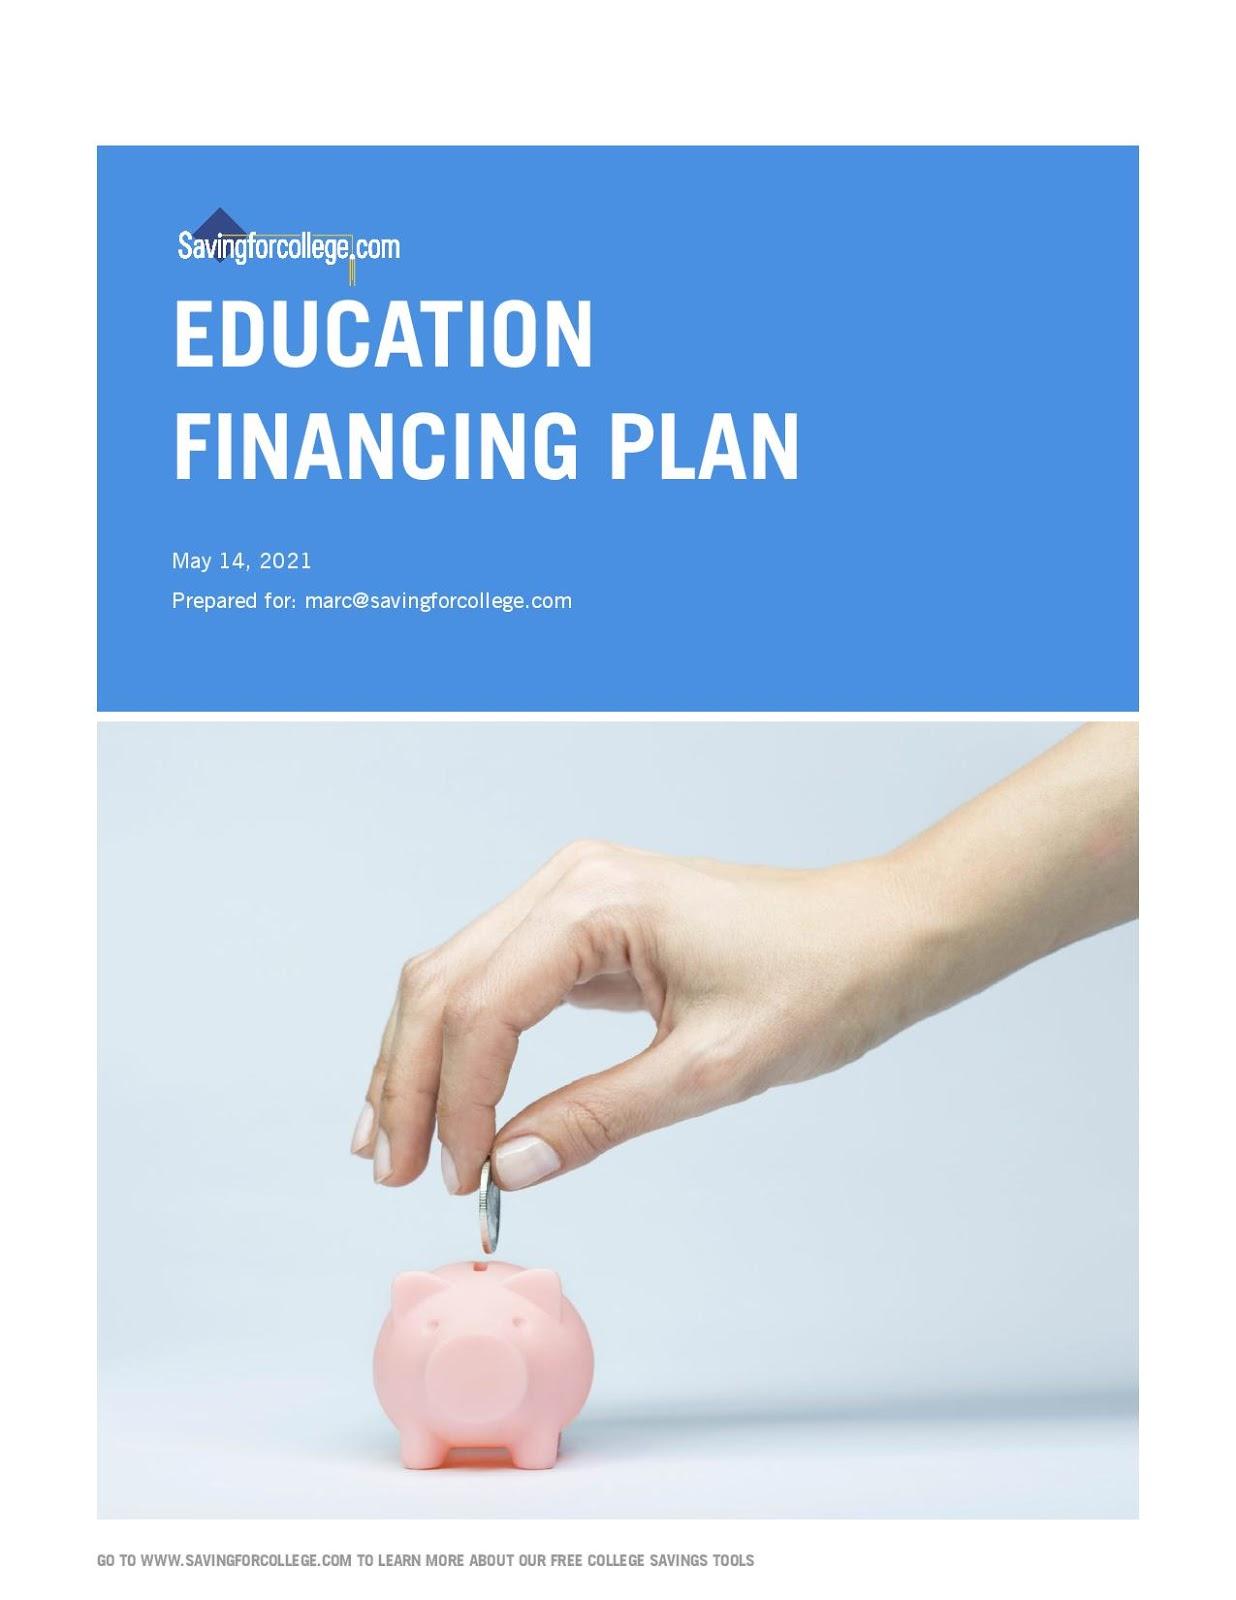 Education Financing Plan